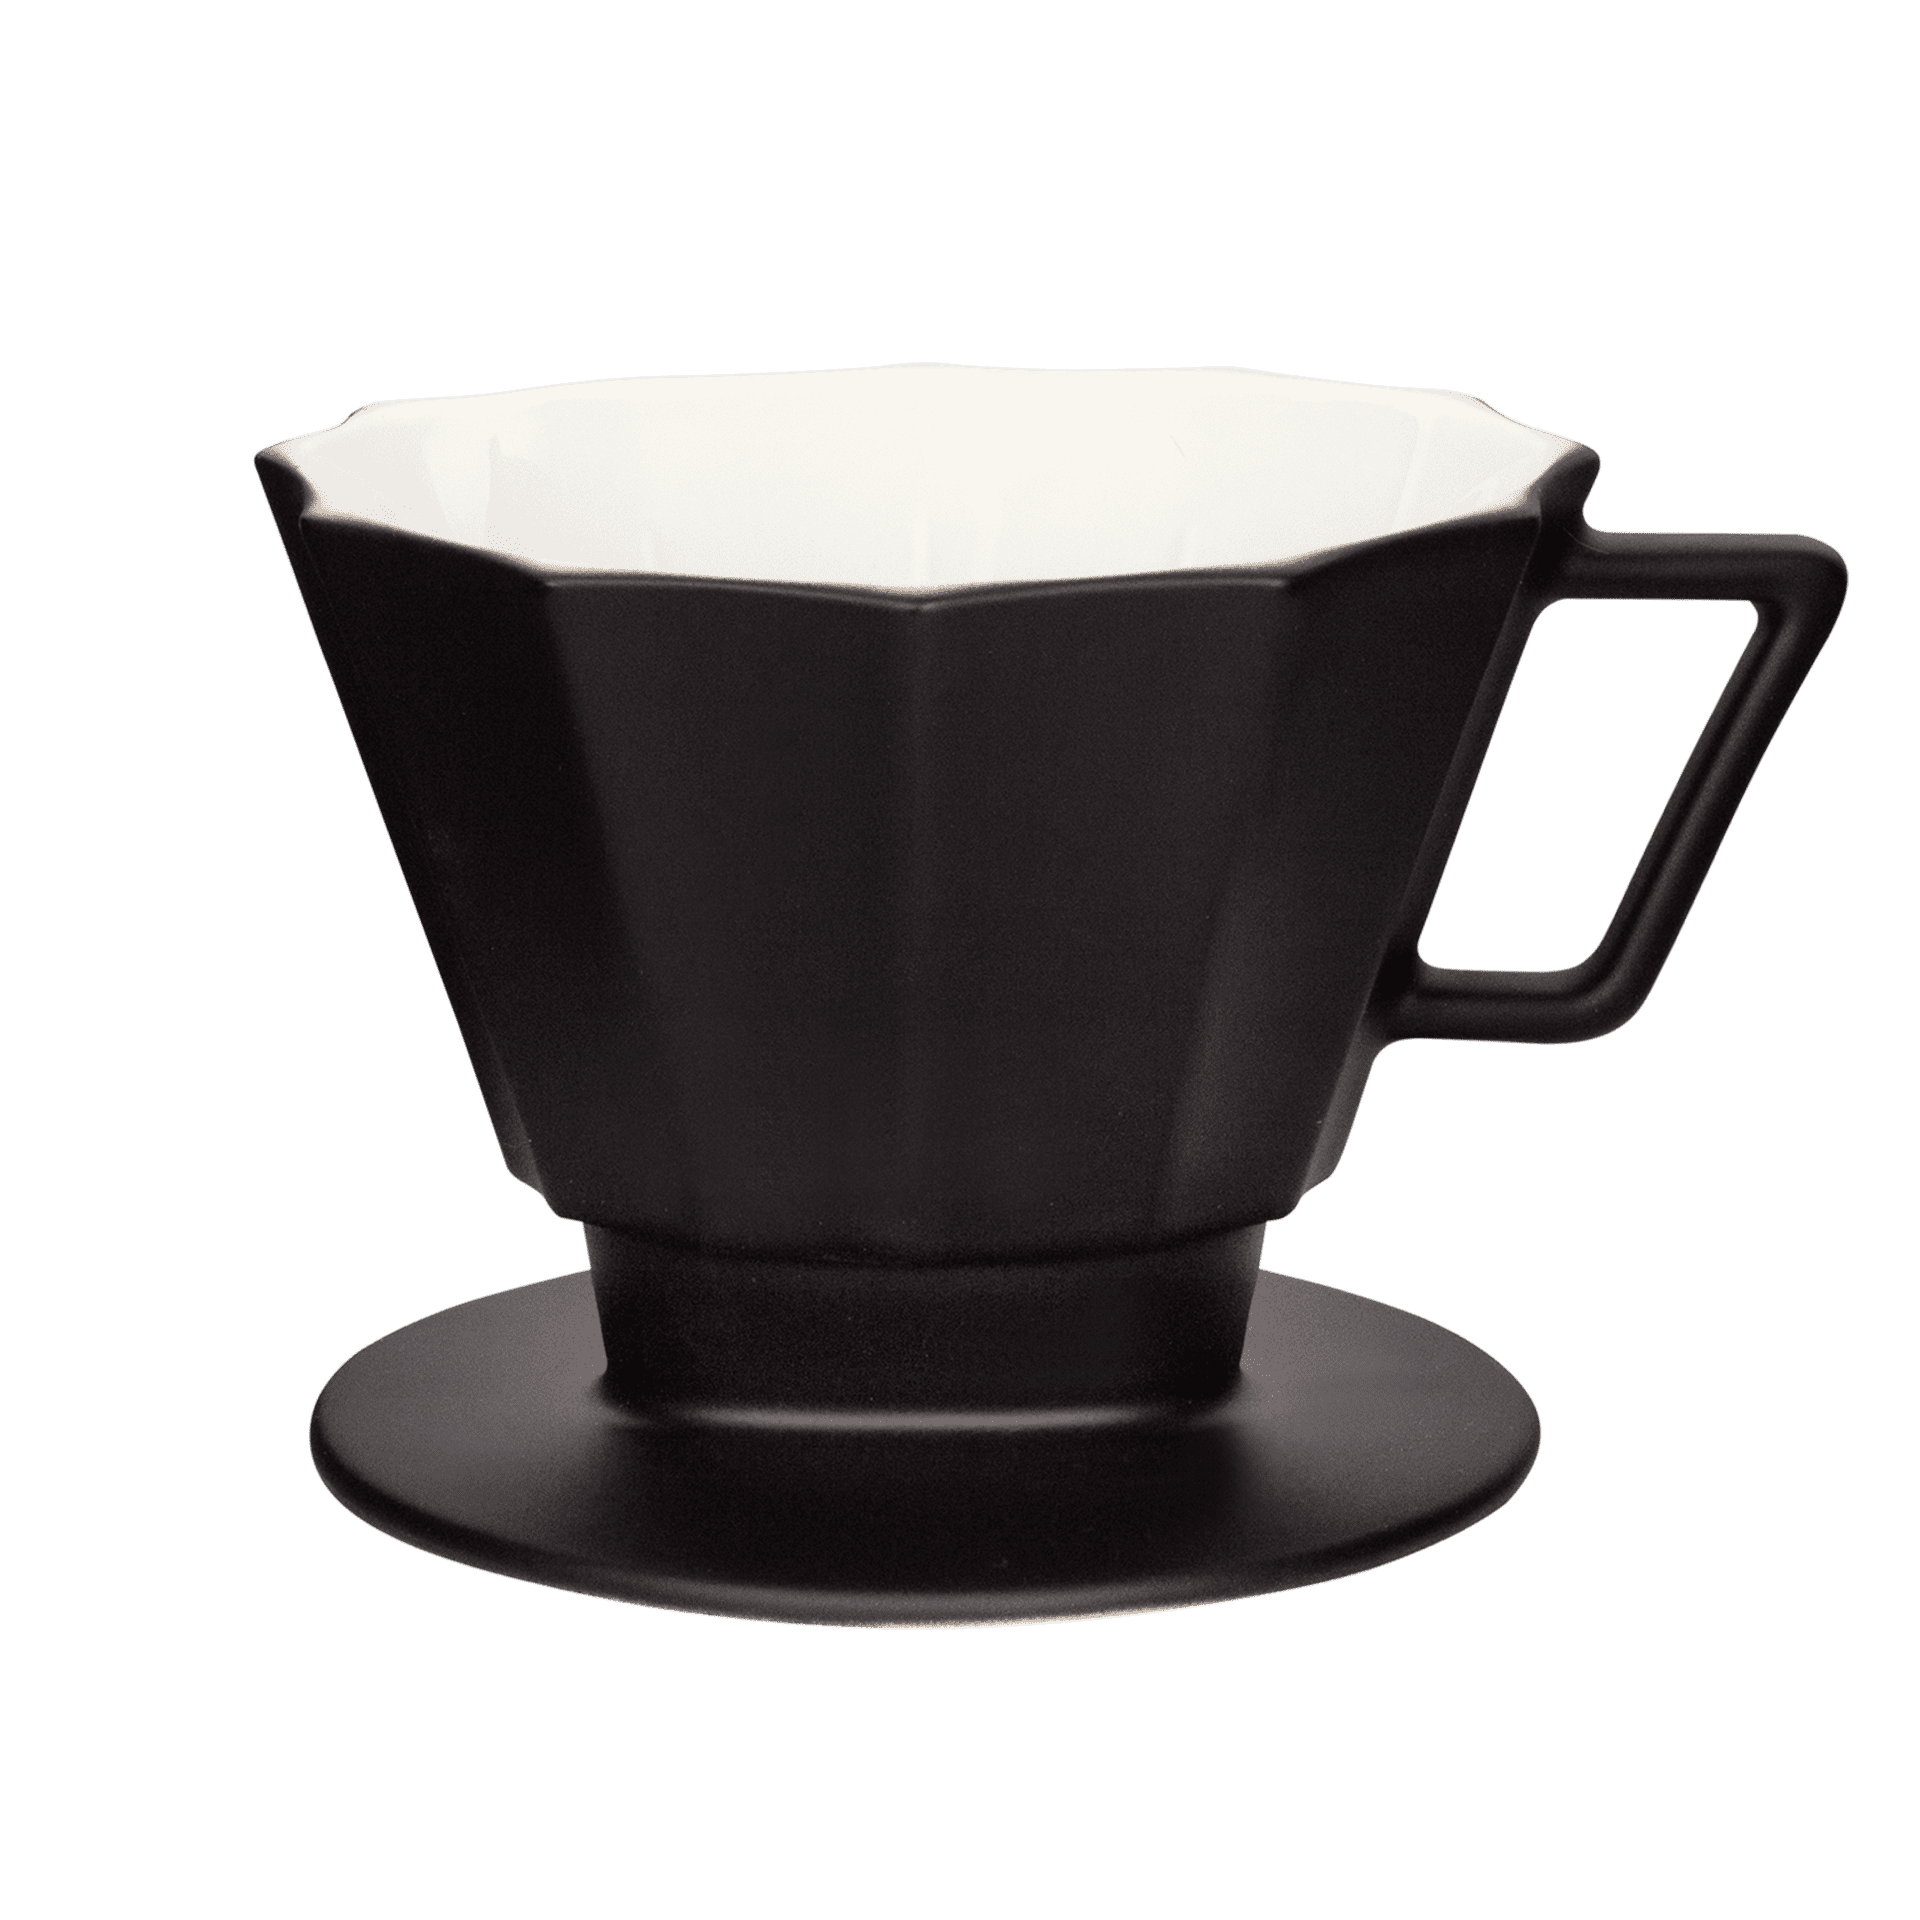 hochwertiger schwarzer kaffeefilter in matt-optik  groesse 4 1x4